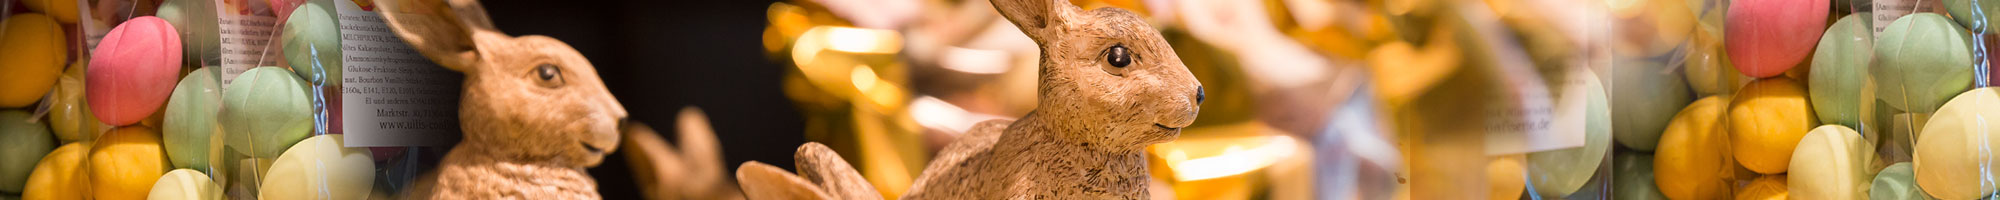 Osterschokolade: Schokohasen, Krokanteier, bunte Eier, Pralineneier und vieles mehr